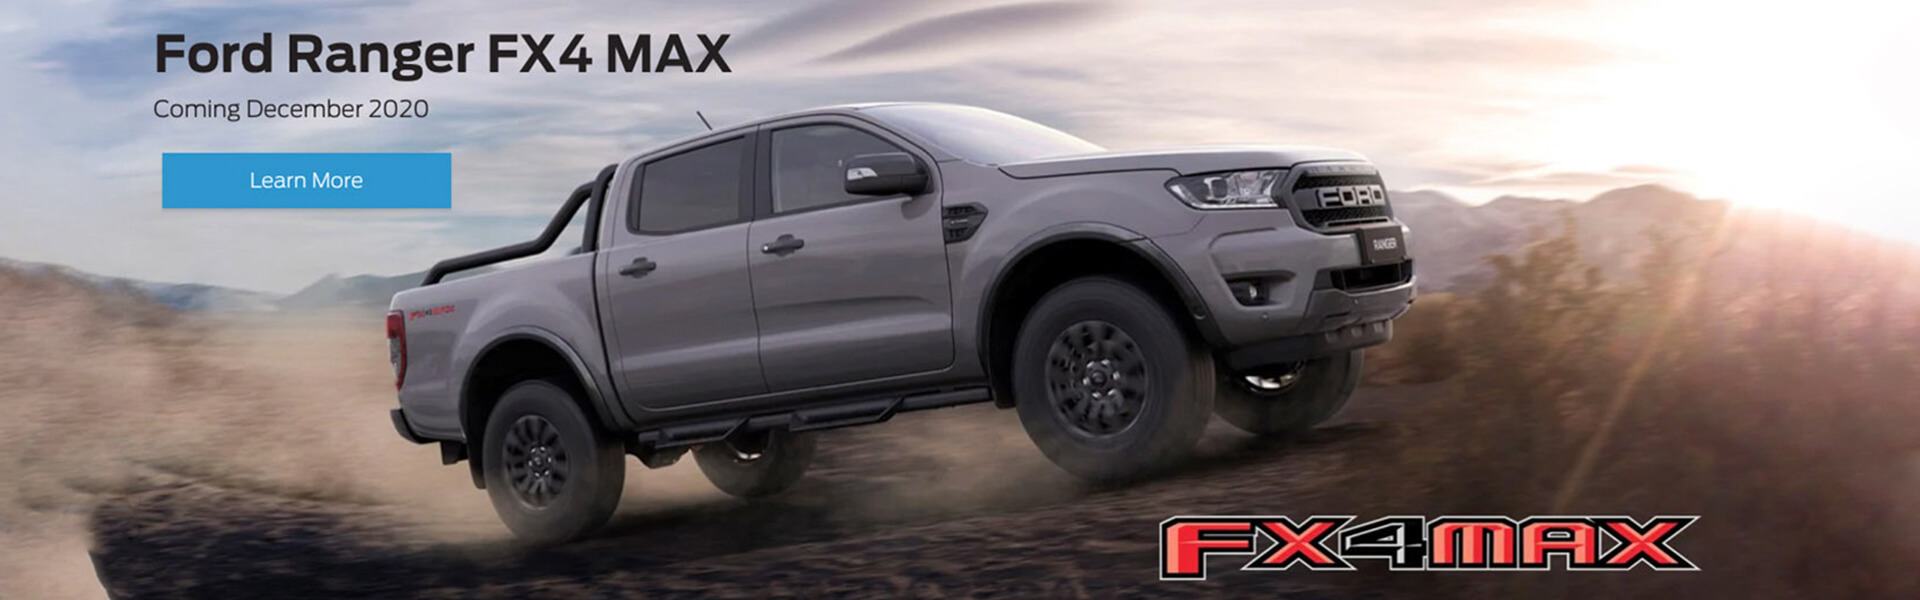 Ford Ranger FX4 MAX - Coming December 2020